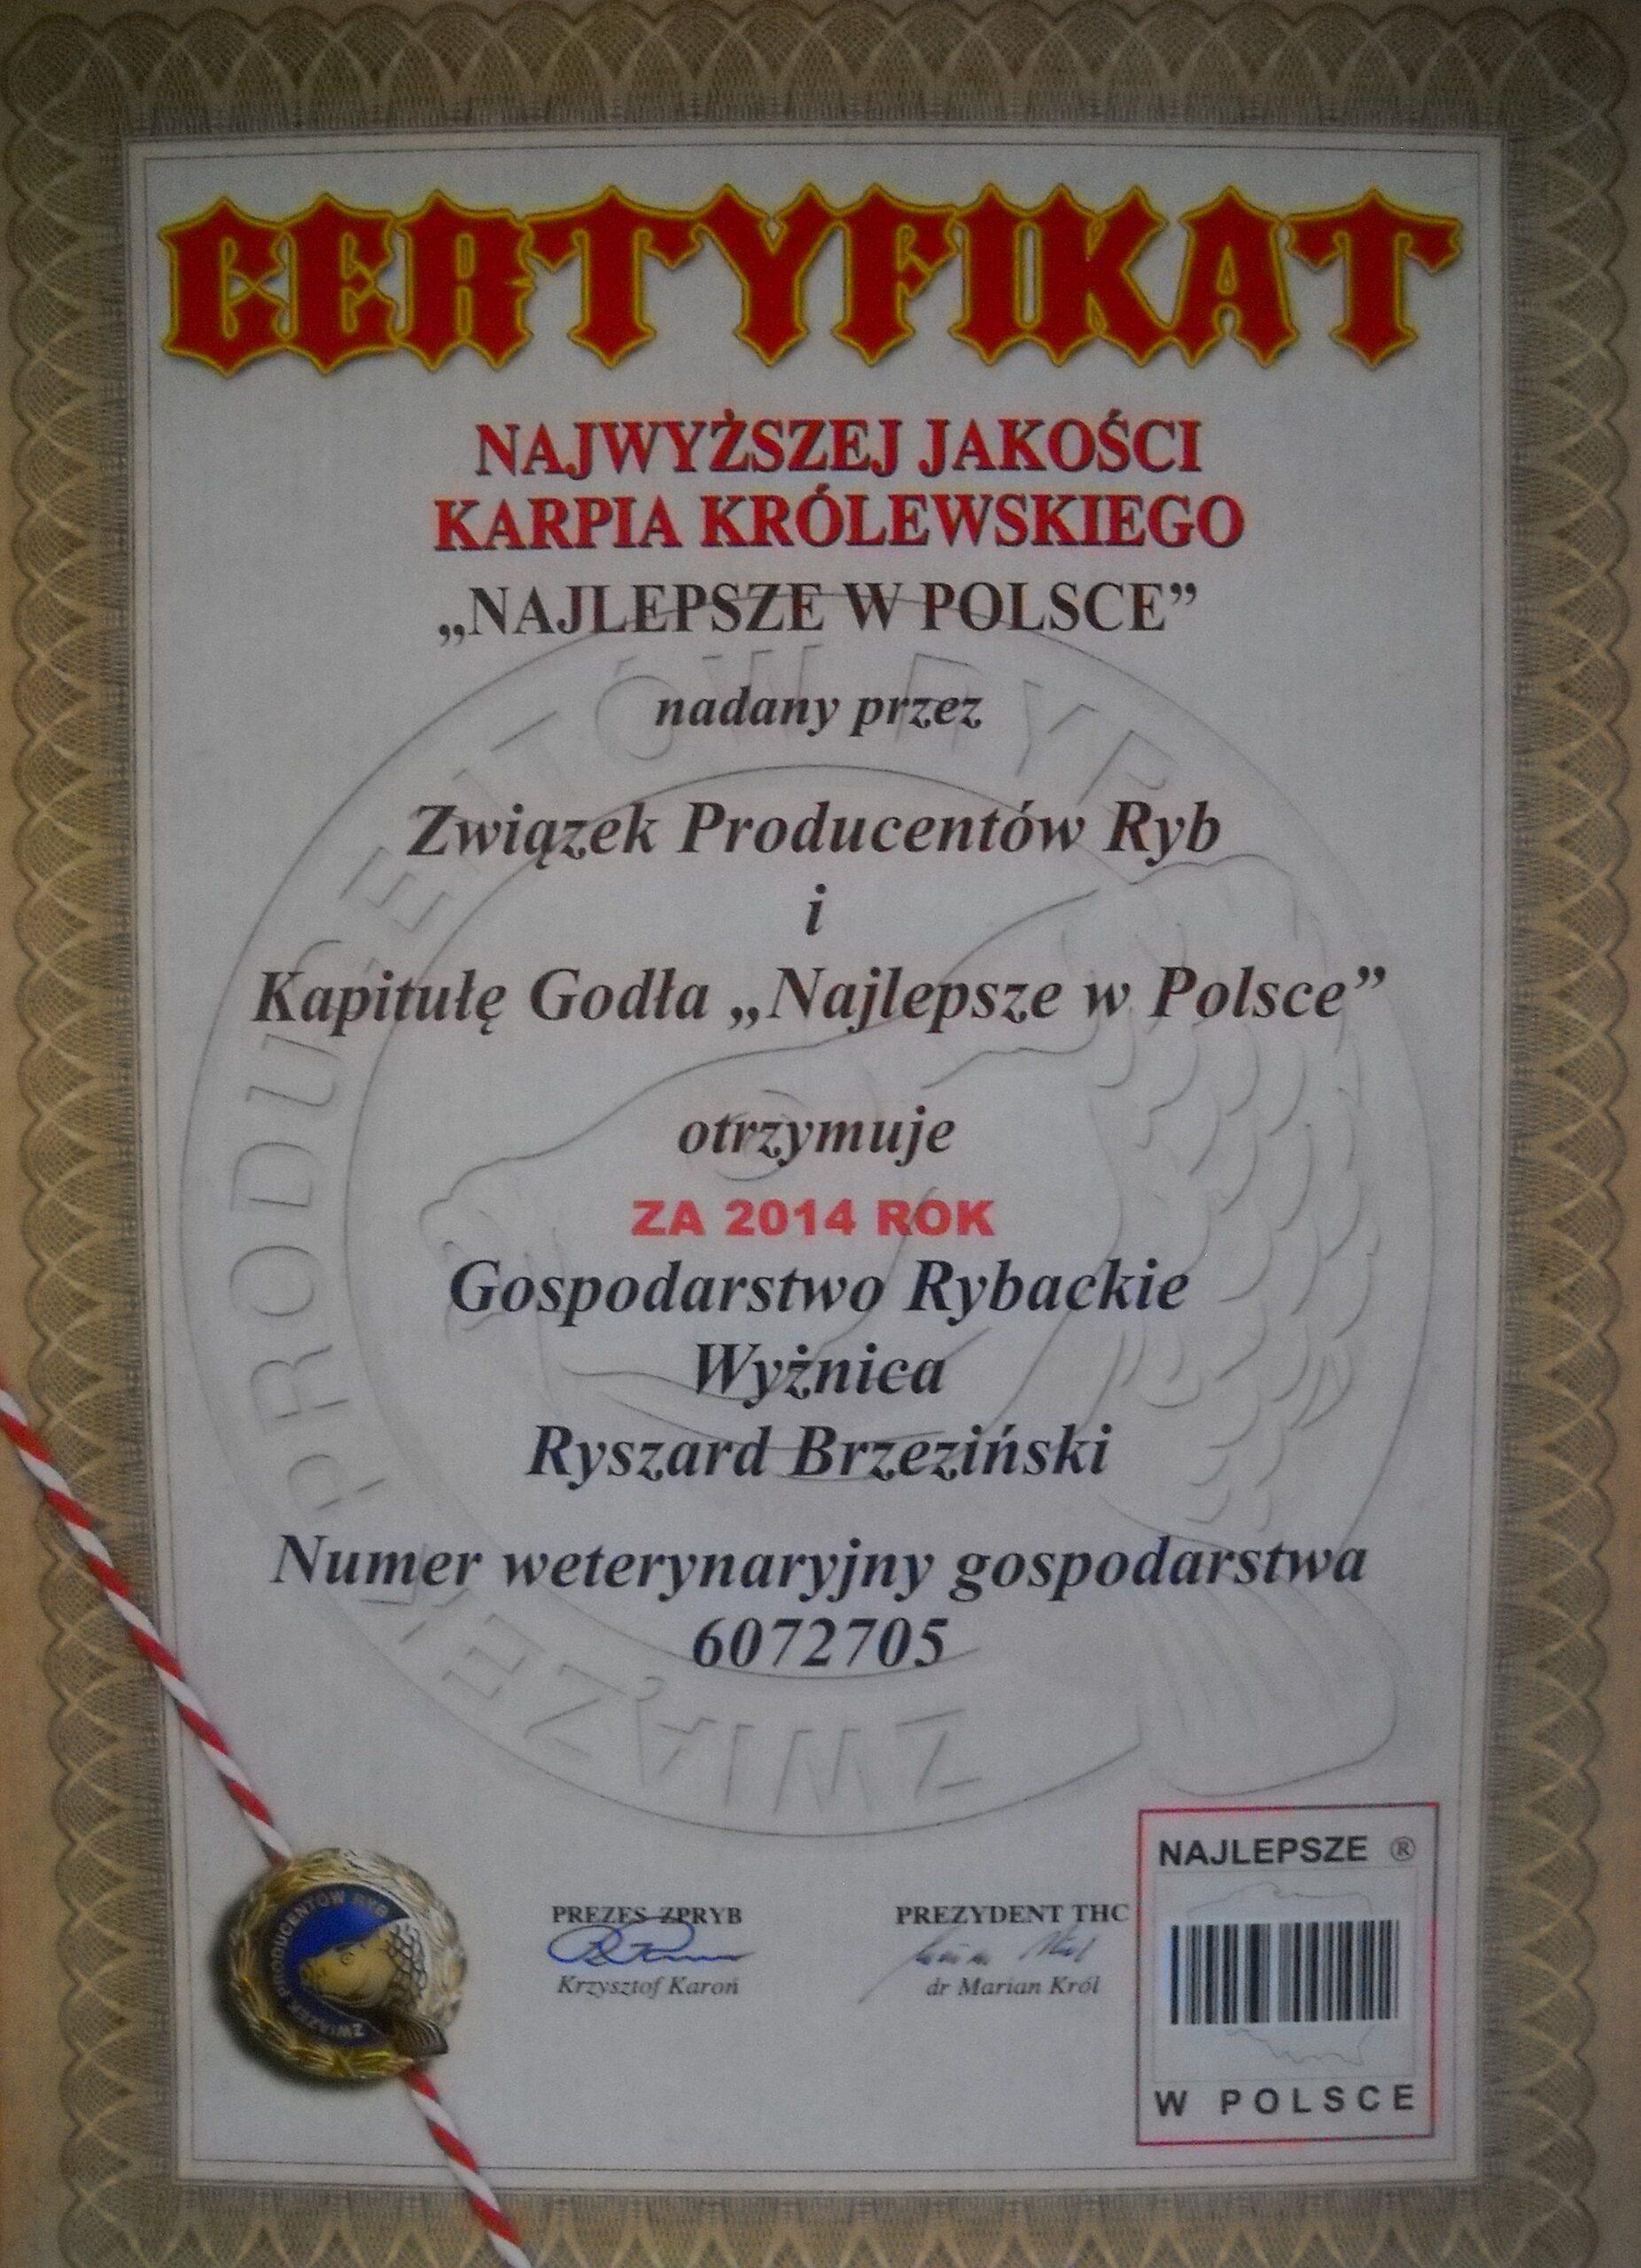 certyfikat scaled